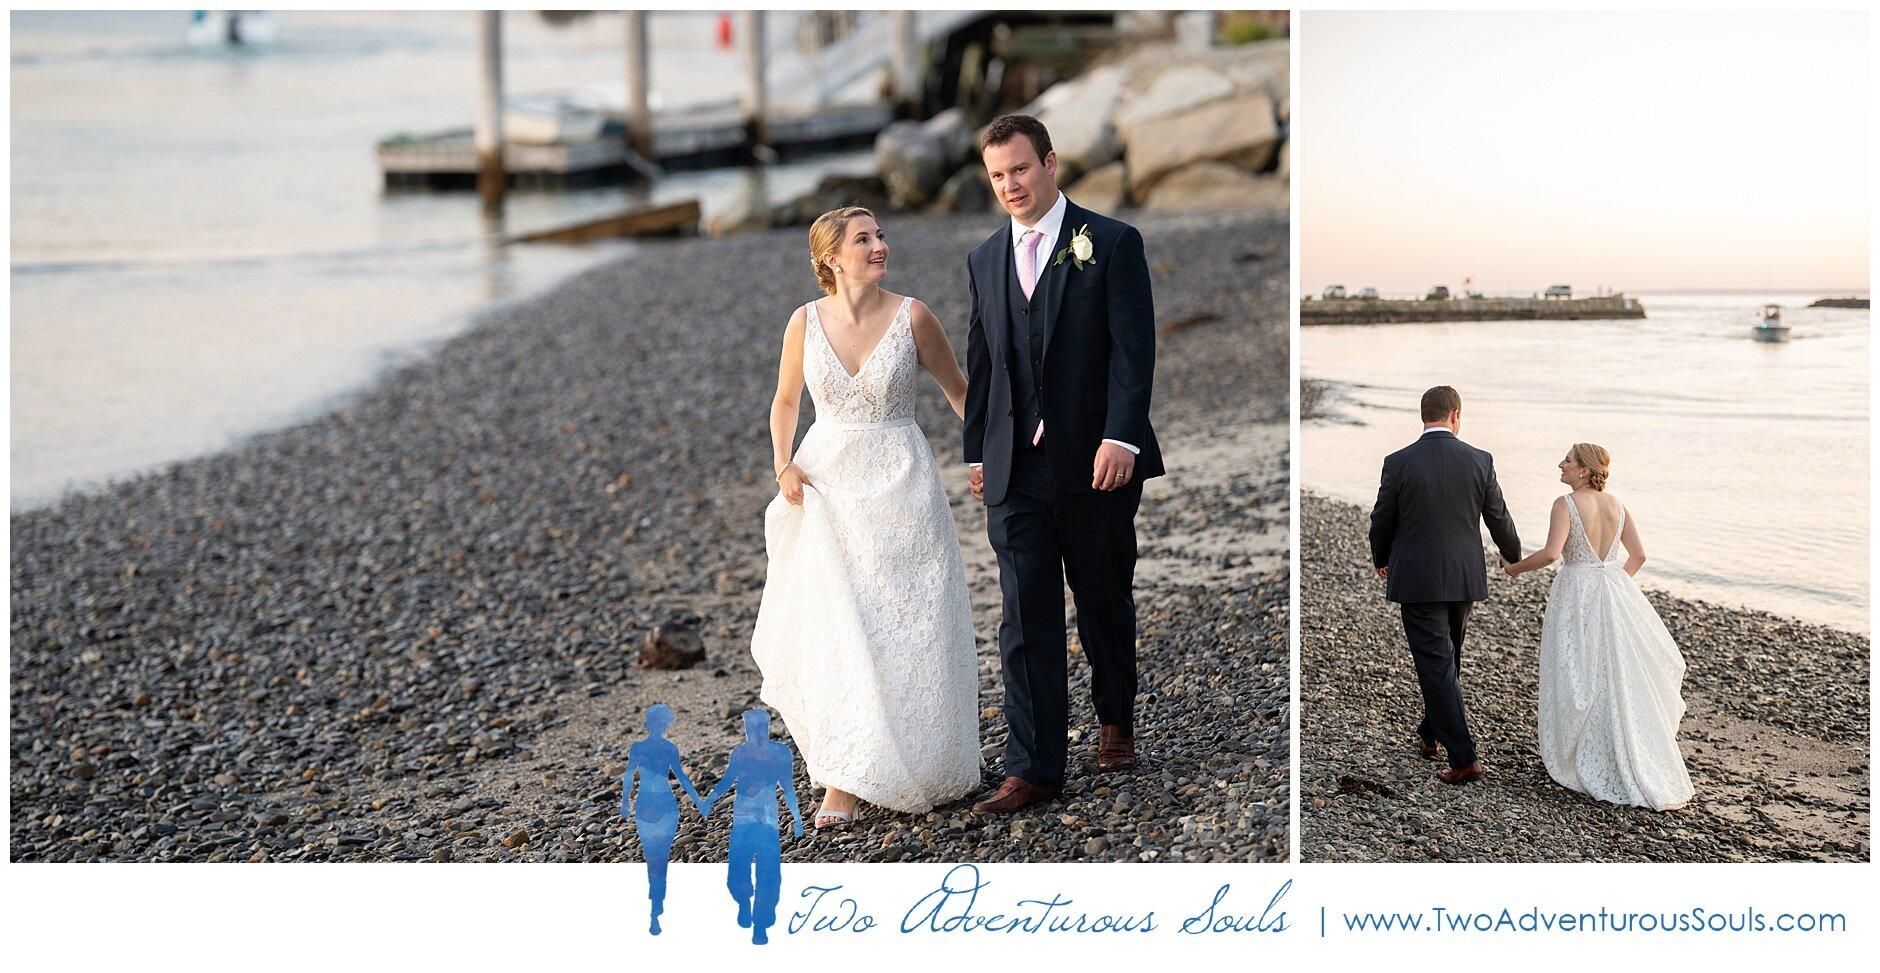 Breakwater Inn and Spa Wedding Photographers, Kennebunkport Wedding Photographers, Two Adventurous Souls- 092119_0050.jpg